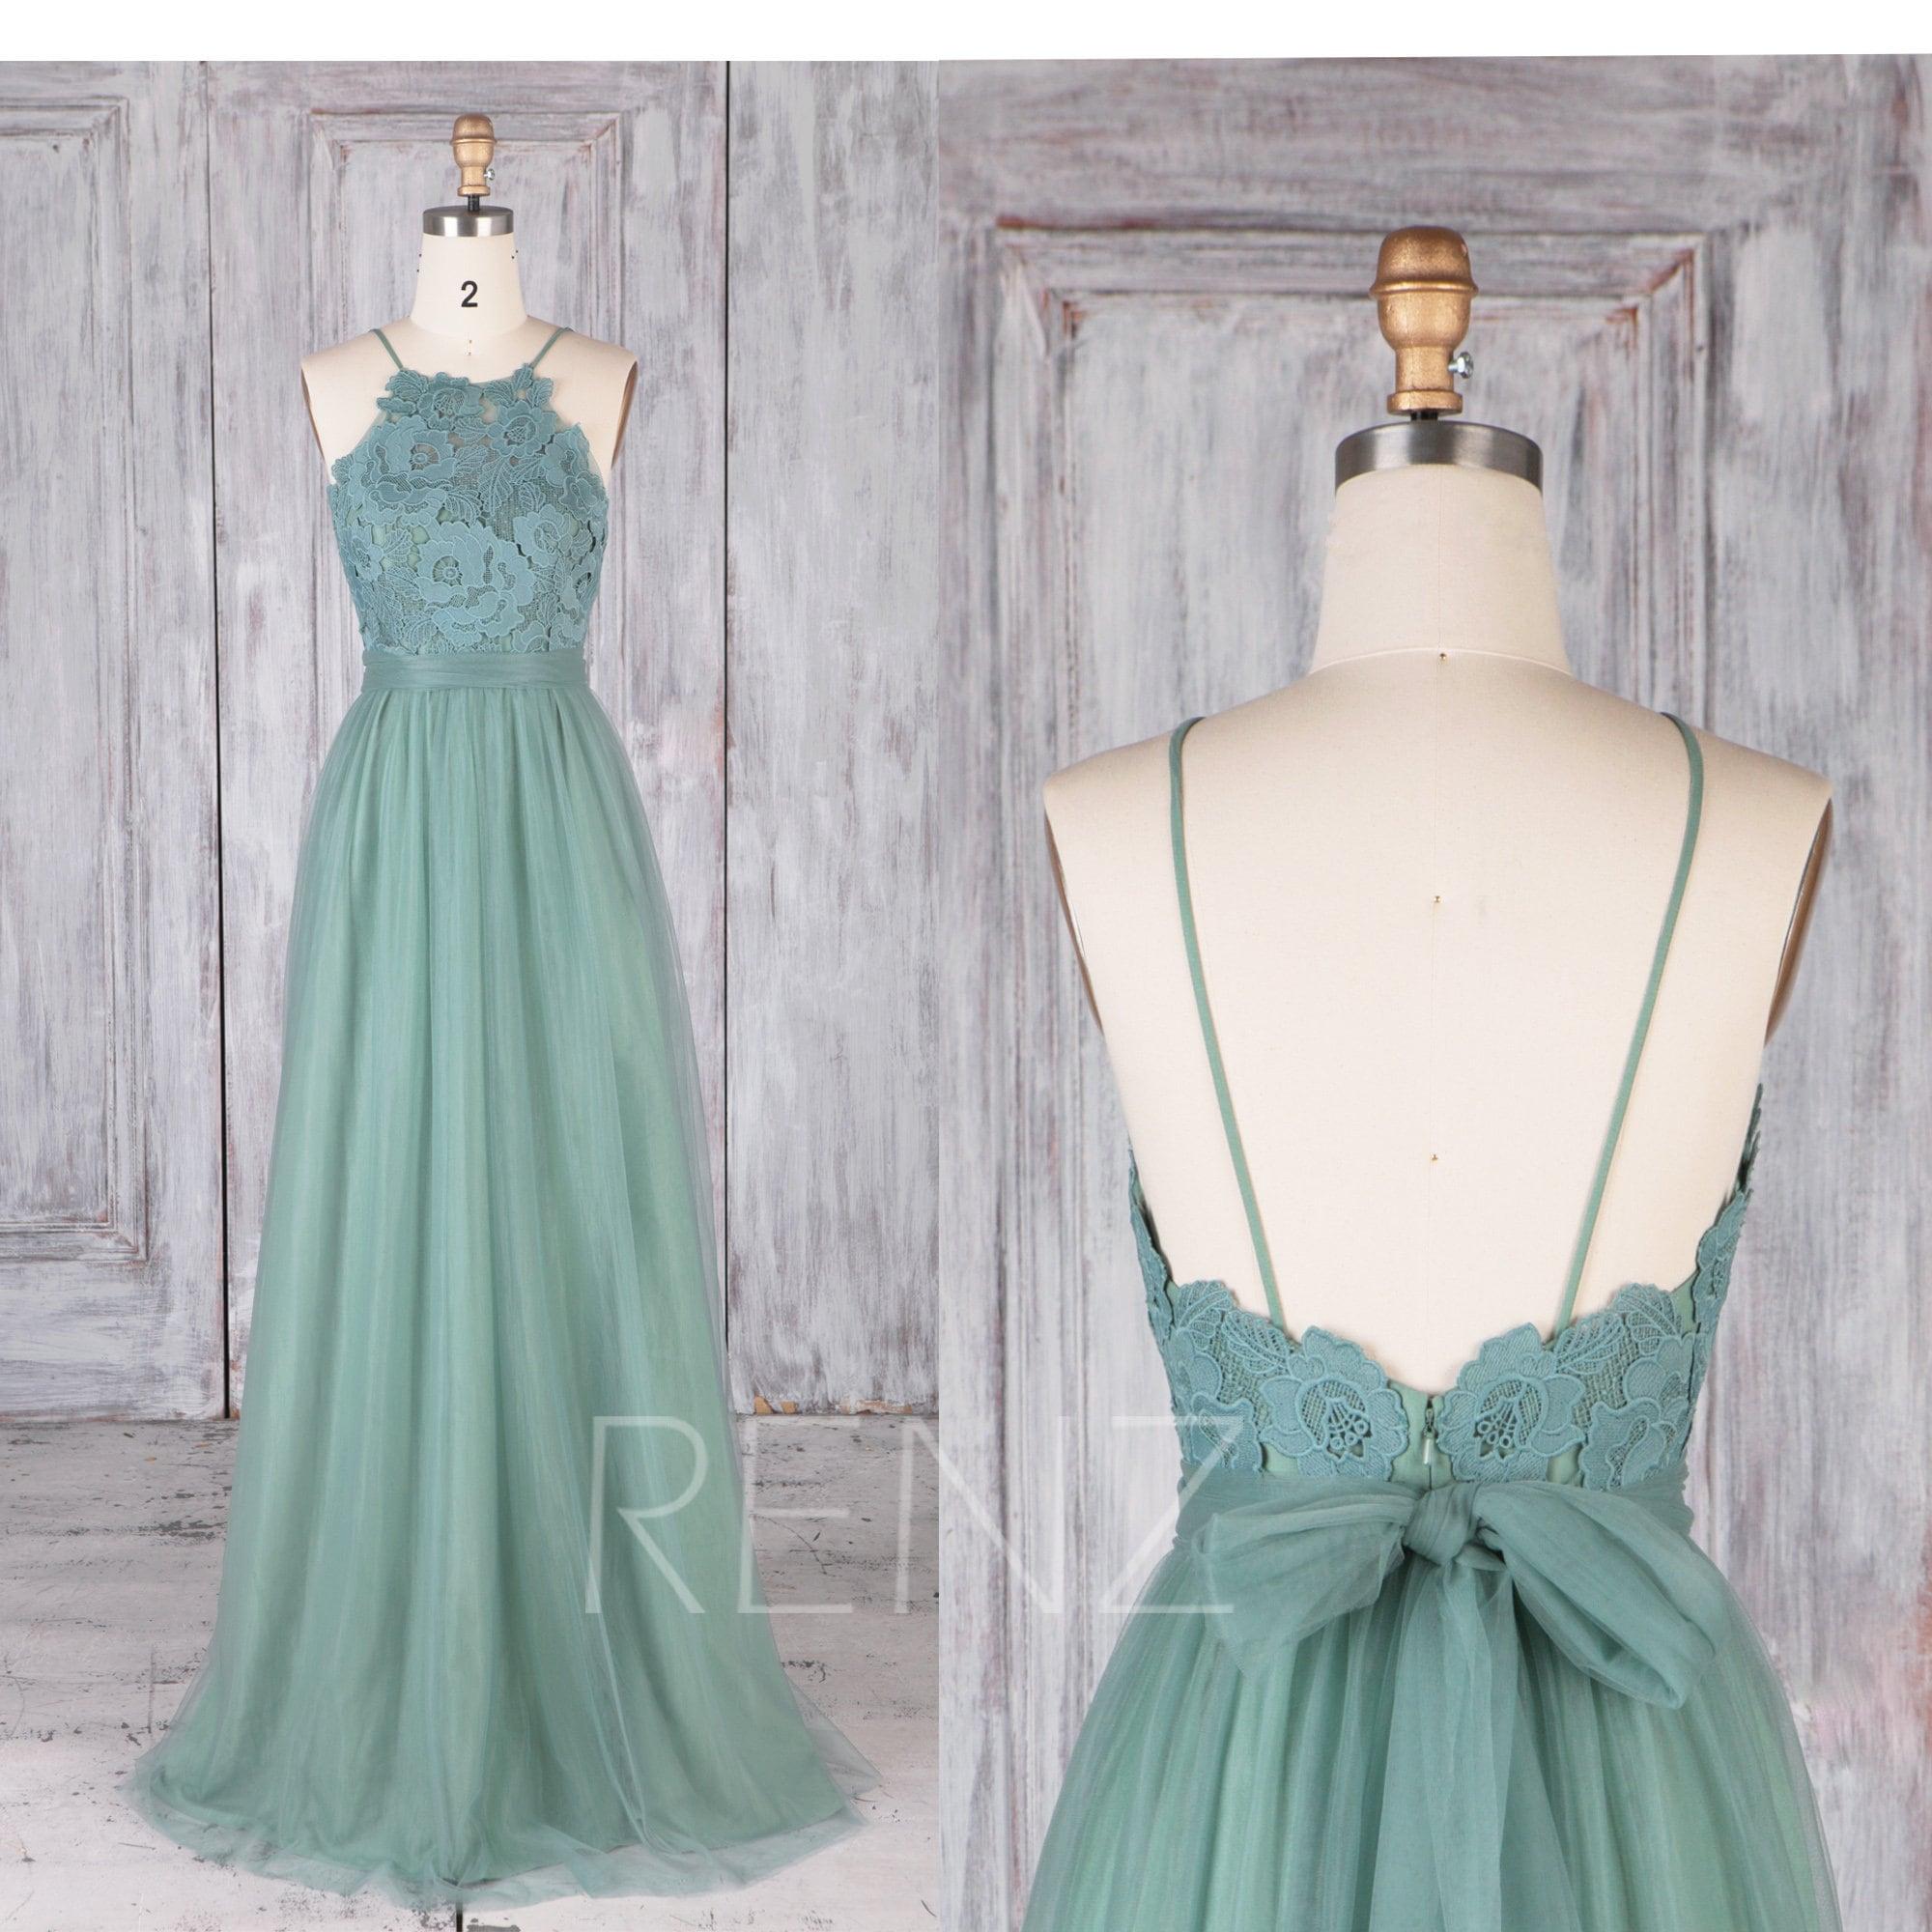 Bridesmaid Dress Dusty Green Tulle DressWedding DressLace